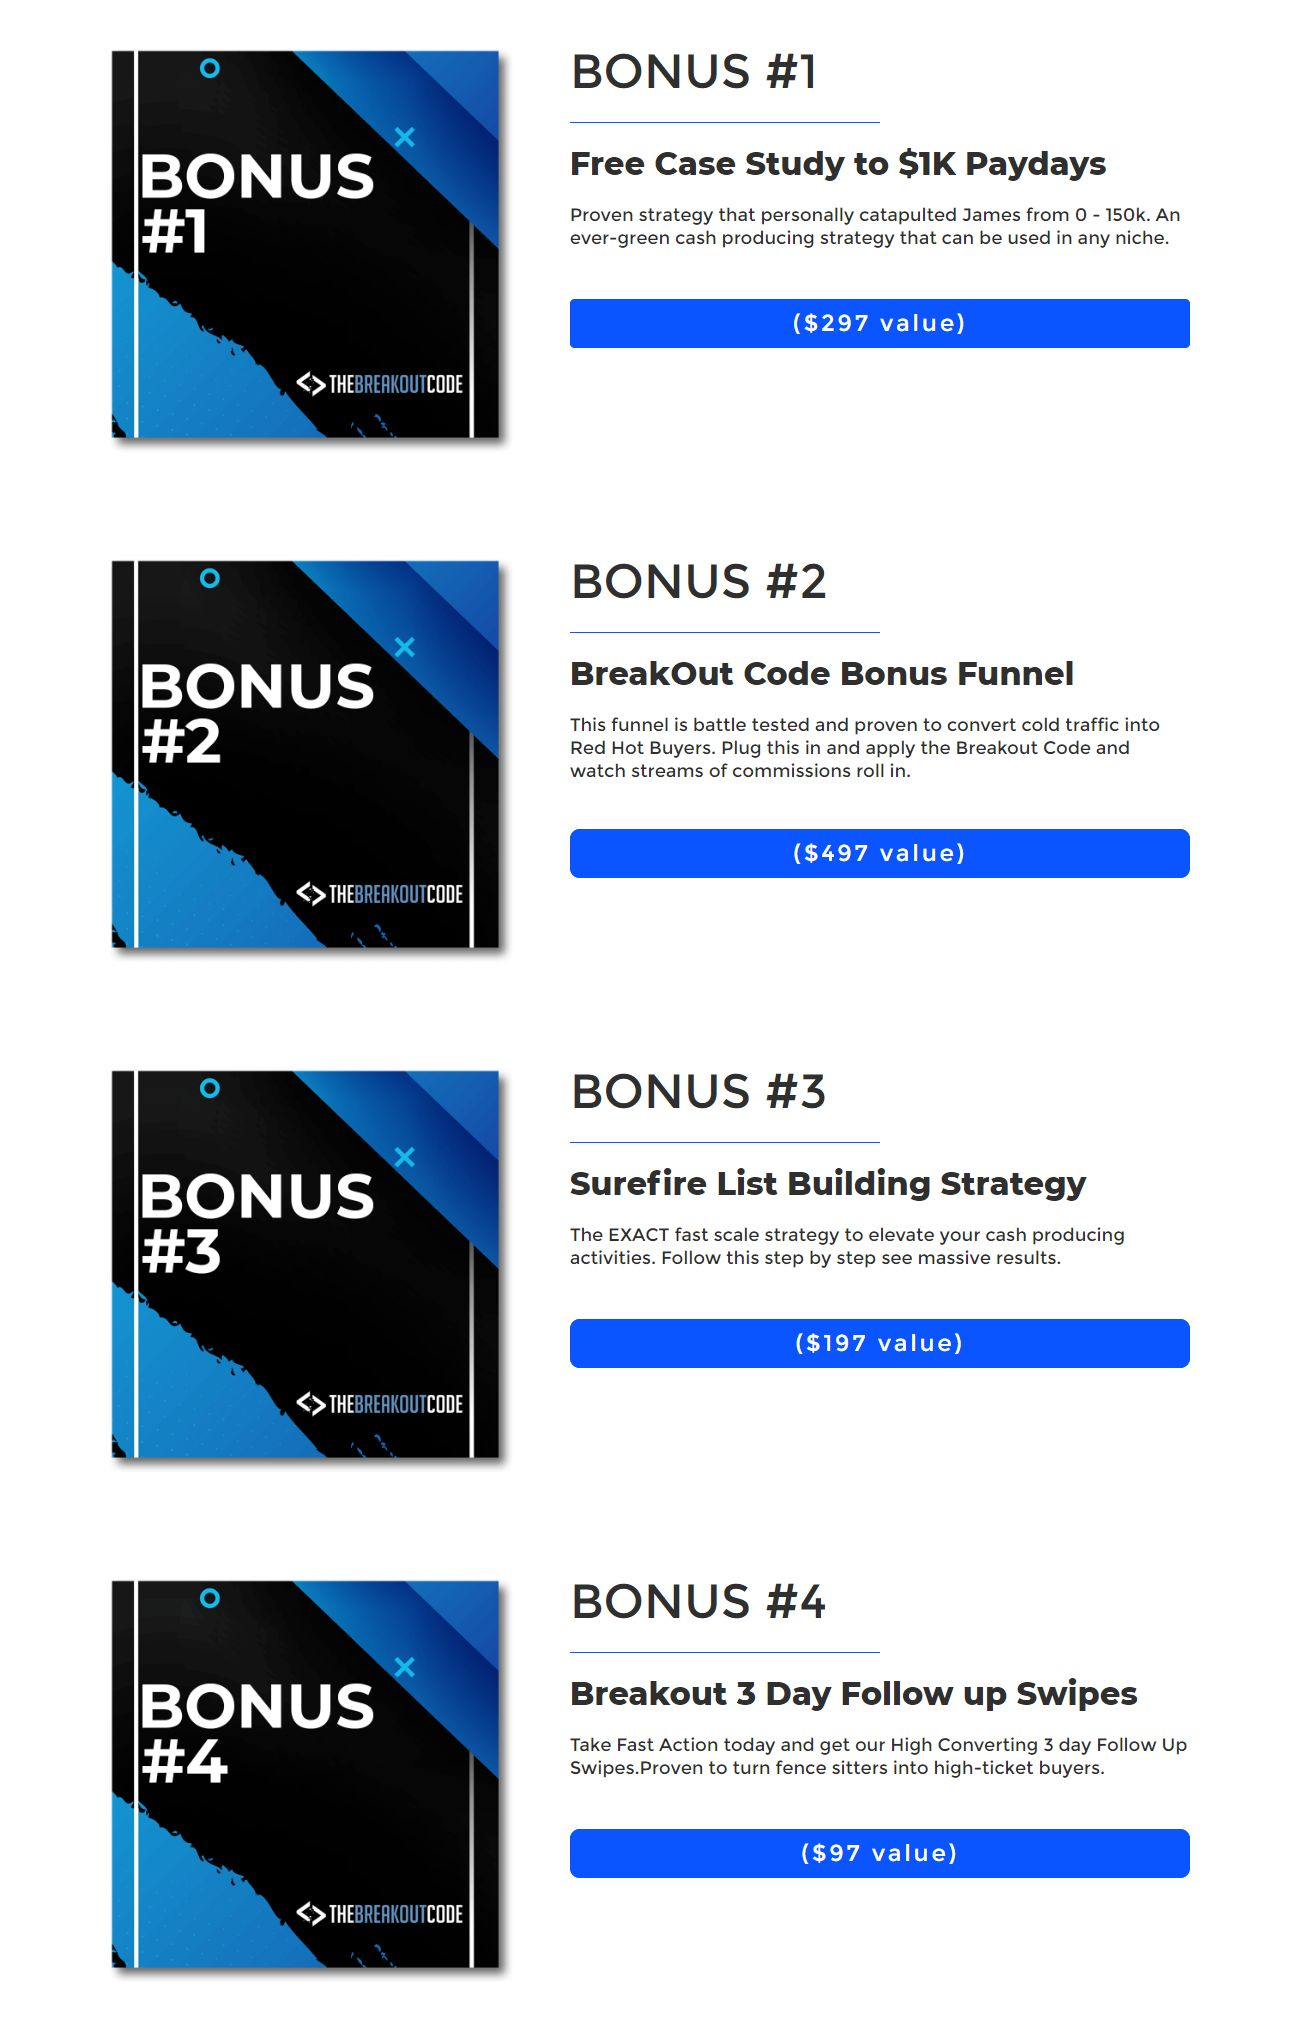 The-Breakout-Code-bonuses